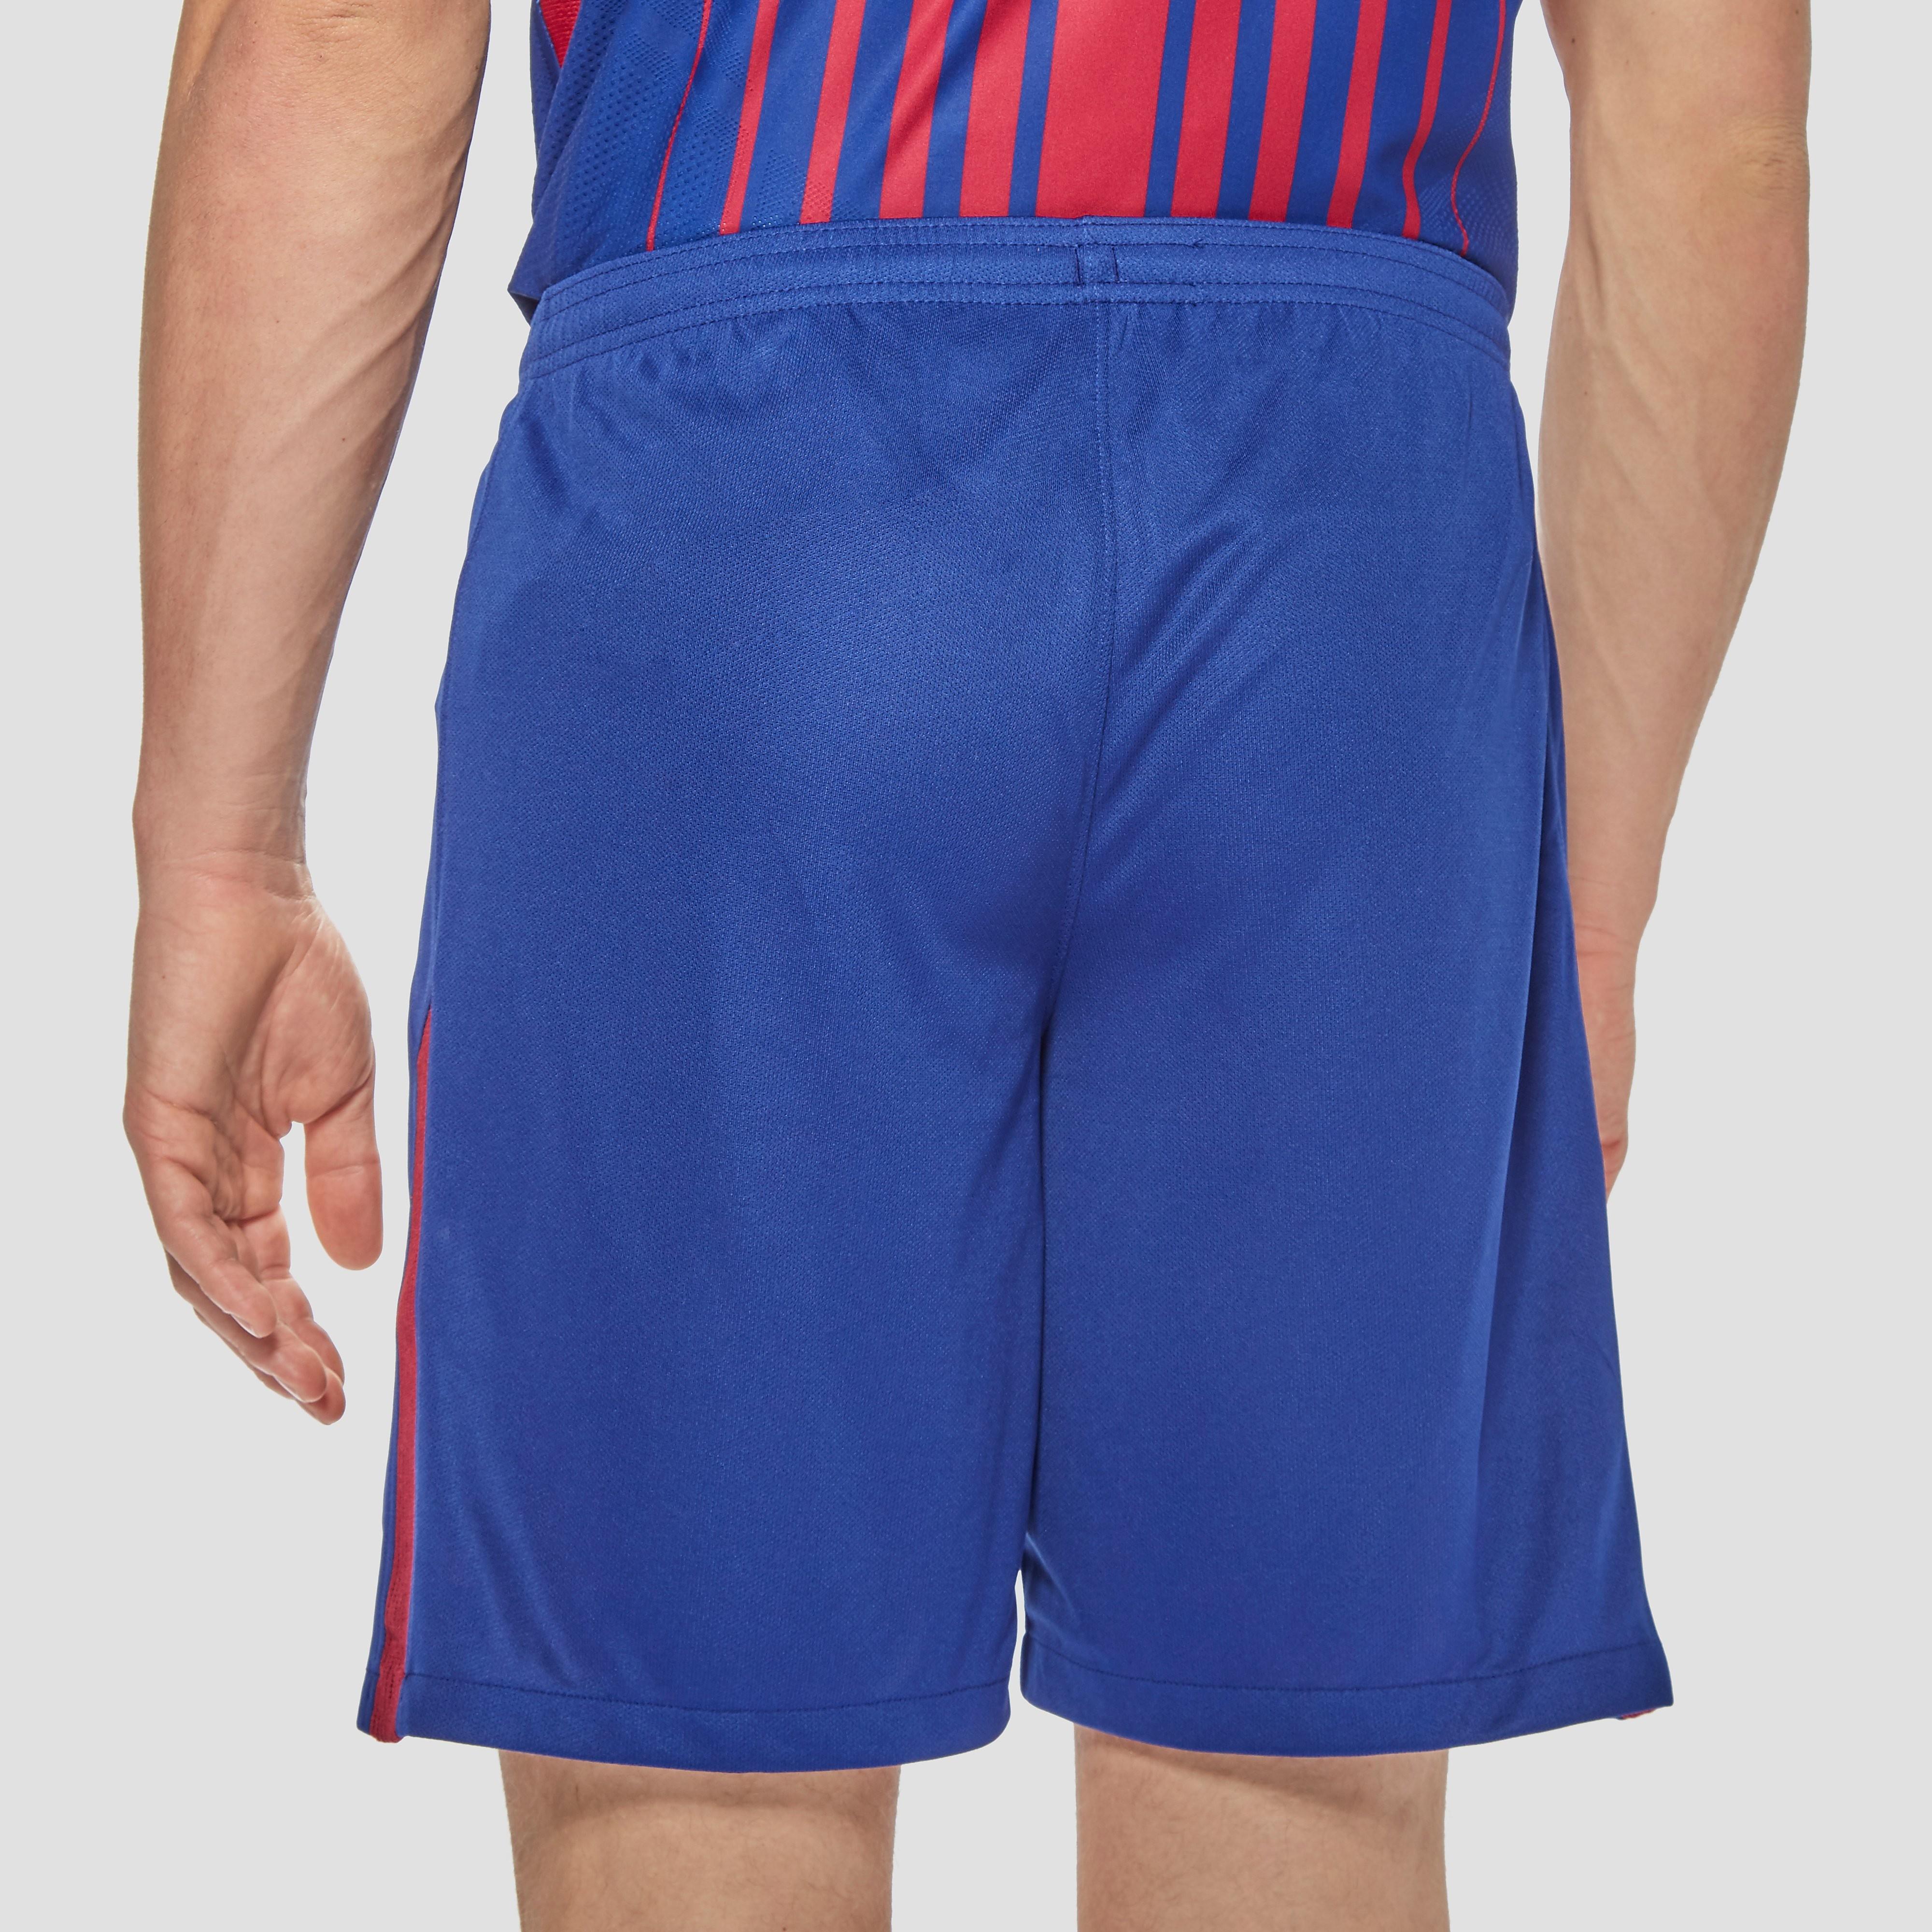 Nike Barcelona 2017/18 Men's Home Shorts